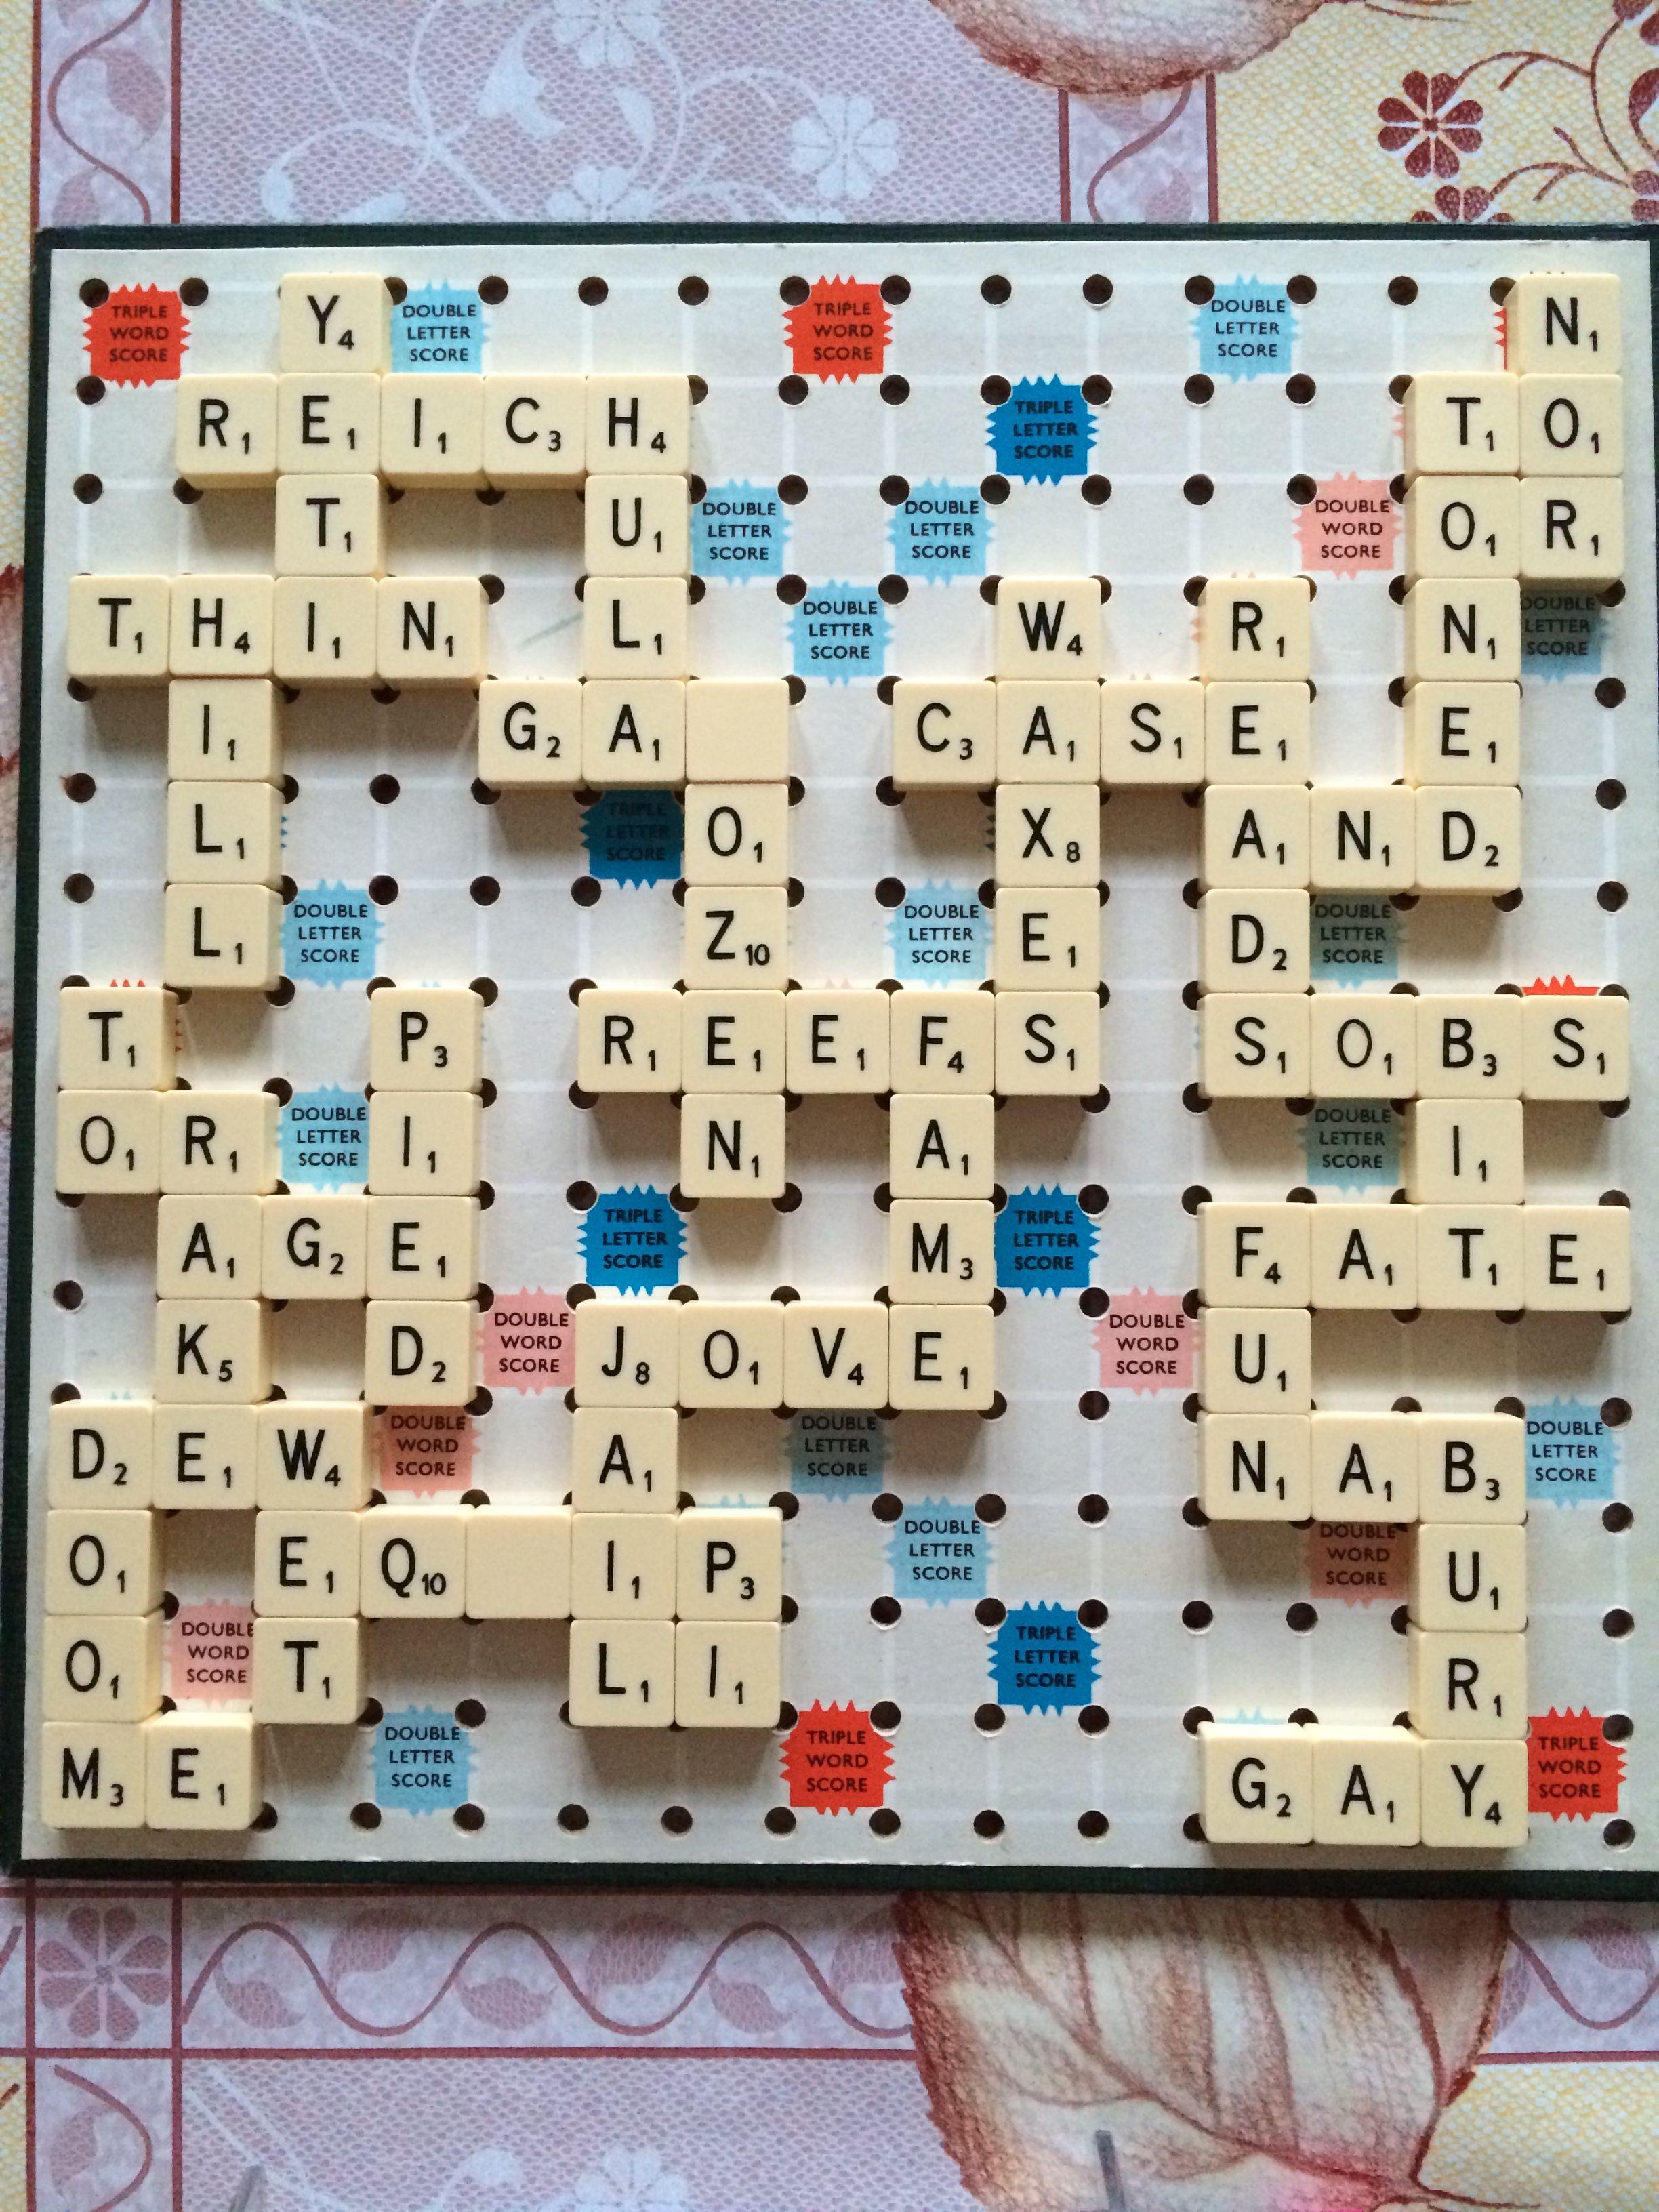 Online Scrabble • Play Online Scrabble Word Game Free